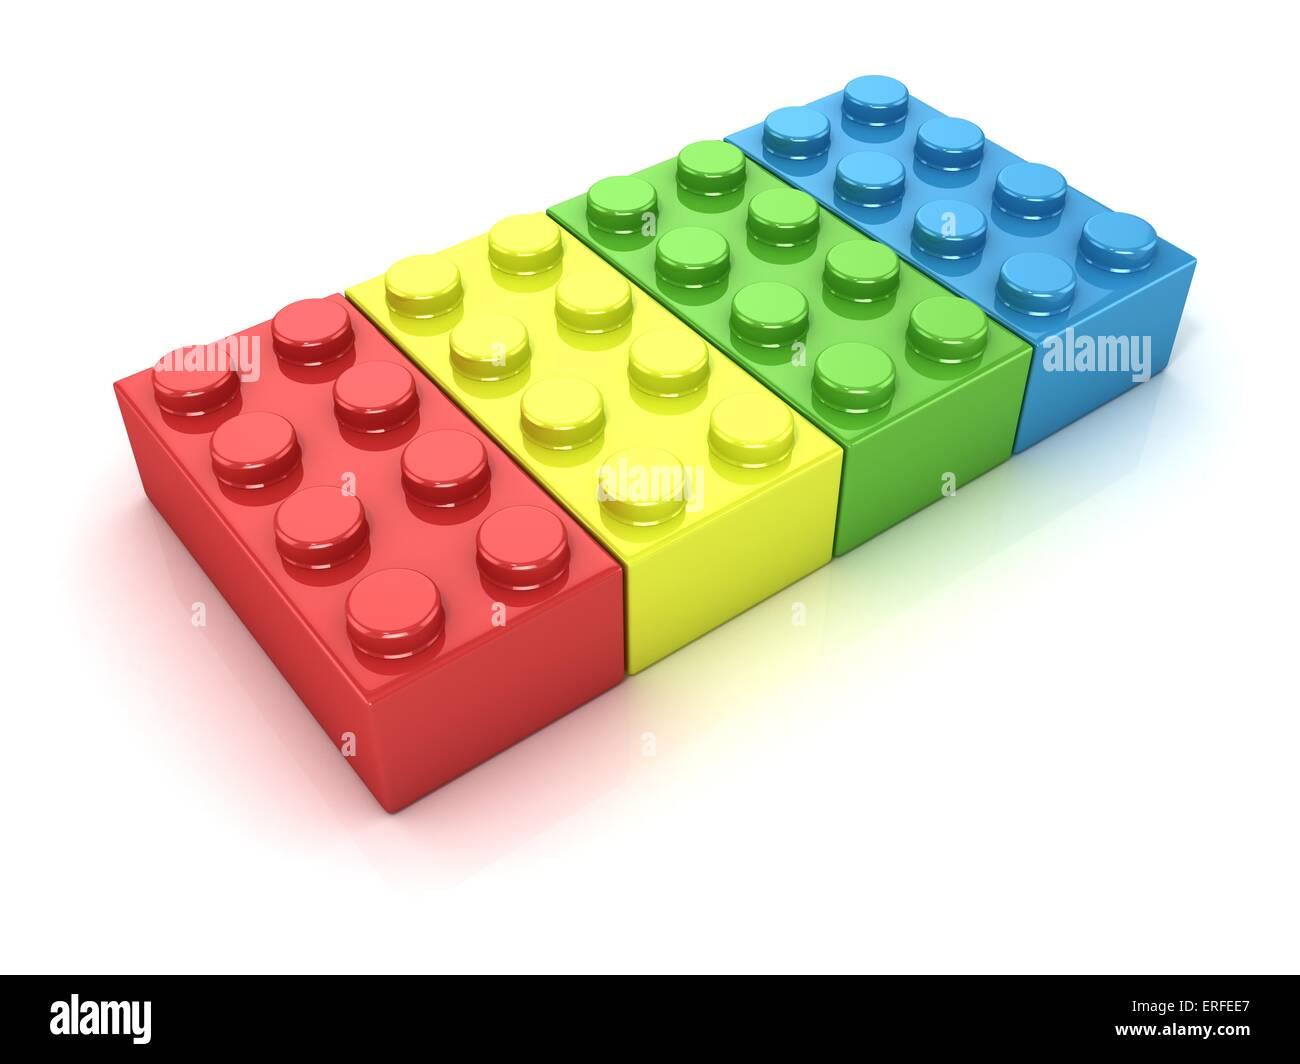 Plastic building blocks  Side view Stock Photo: 83319215 - Alamy